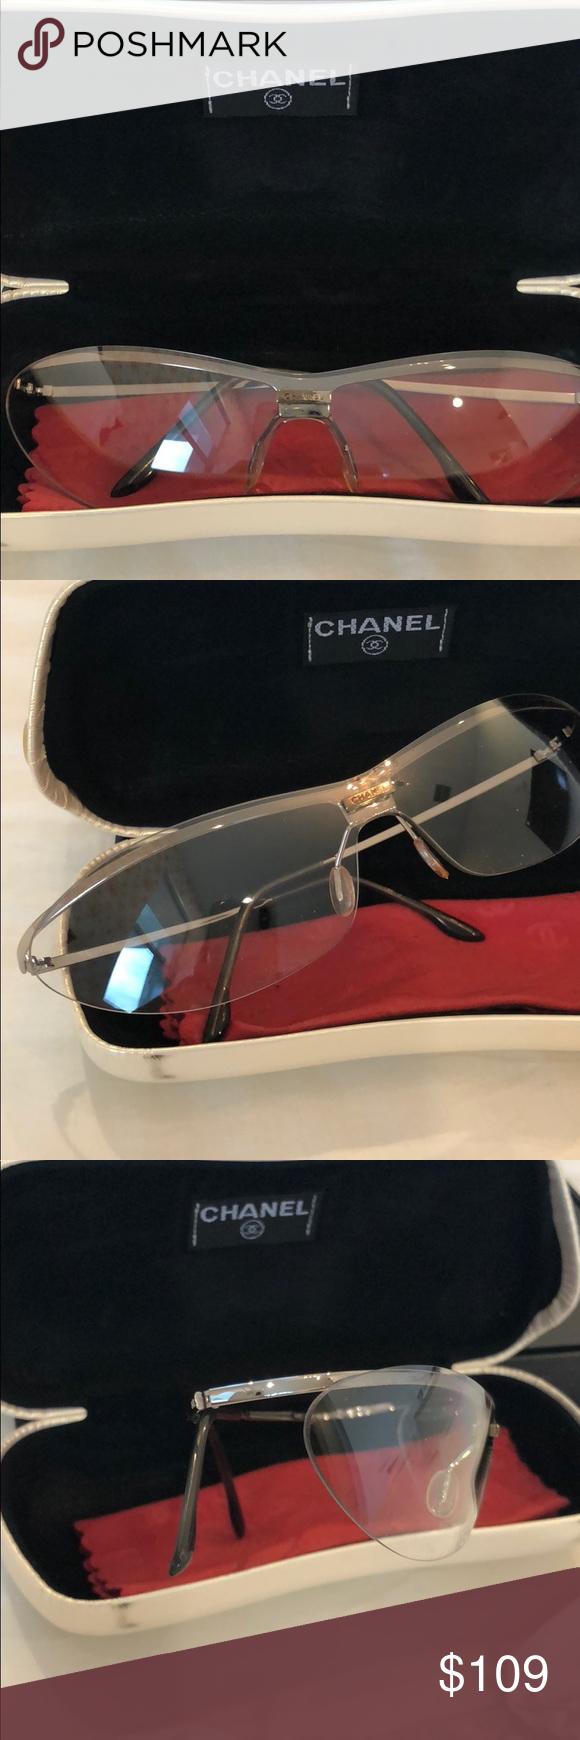 d5e317e3831f Brand New Chanel Sunglasses Brand new, never worn, all tags, case and box